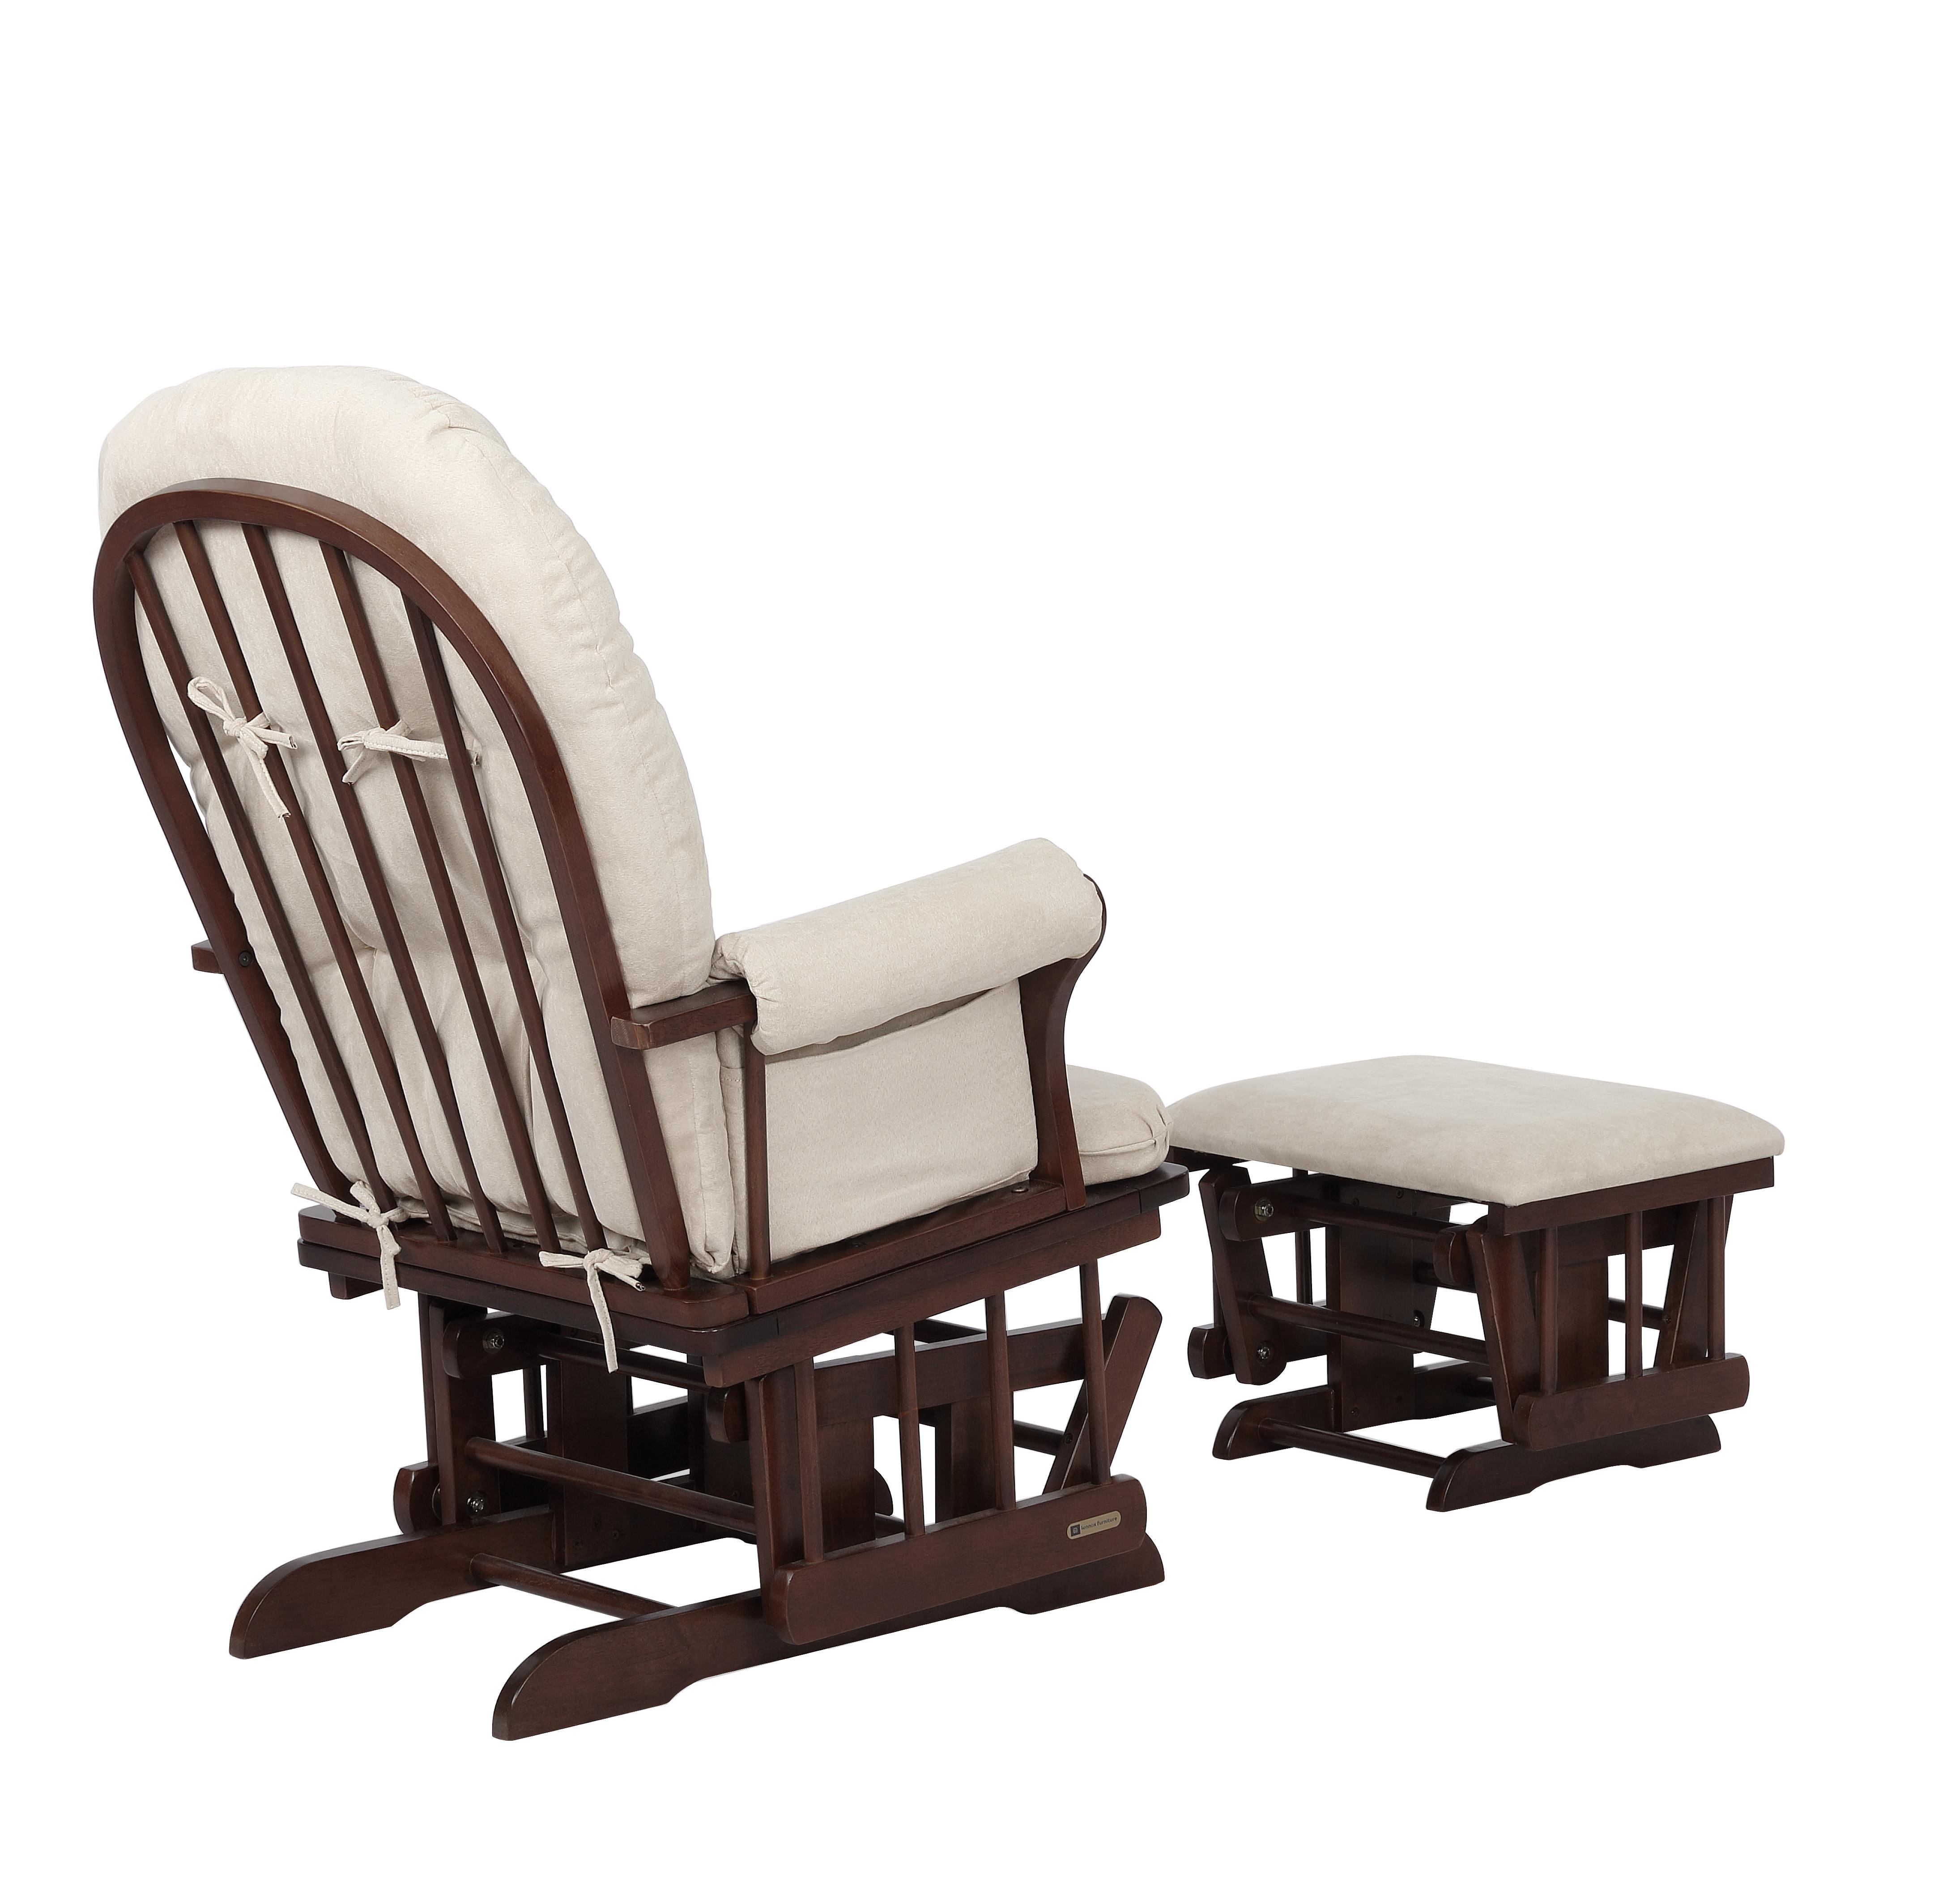 Stupendous Glider Chair And Ottoman Combo Espresso Beige 7083Cb 02 0182 Short Links Chair Design For Home Short Linksinfo